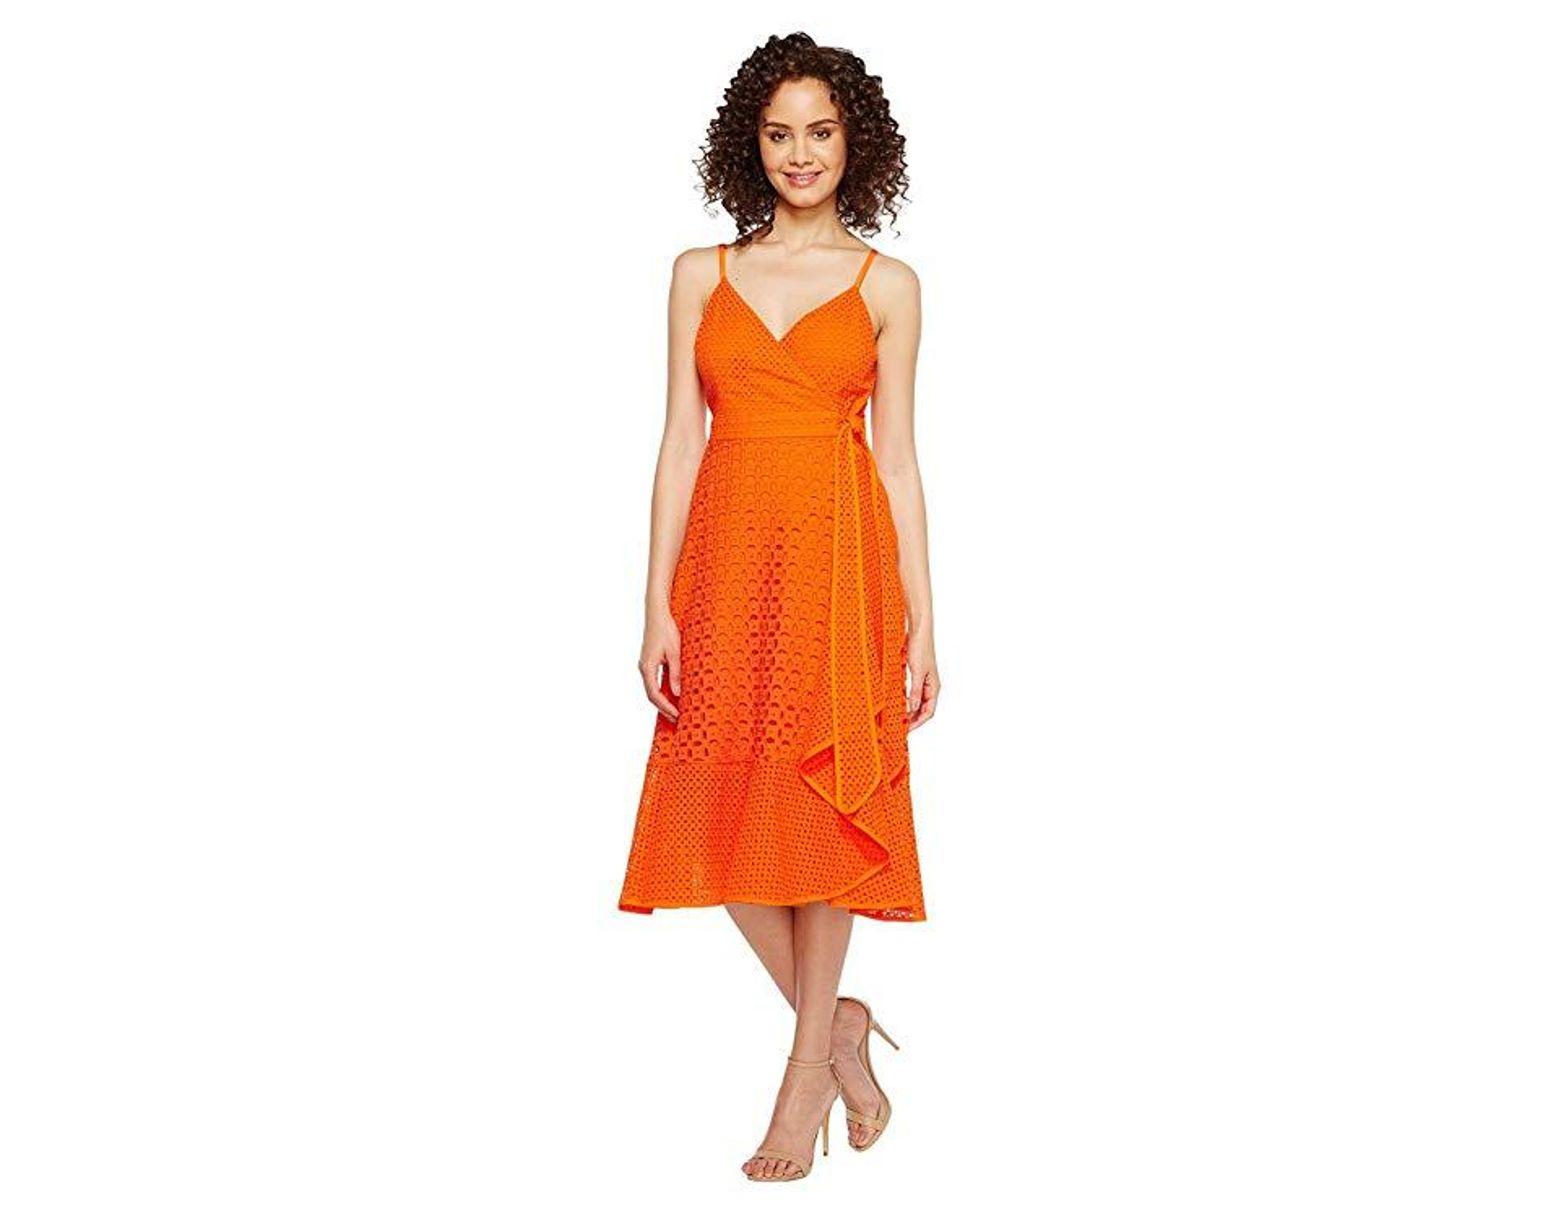 a7c2d11ef9daa3 Trina Turk Kacie Dress (caliente) Dress in Red - Lyst